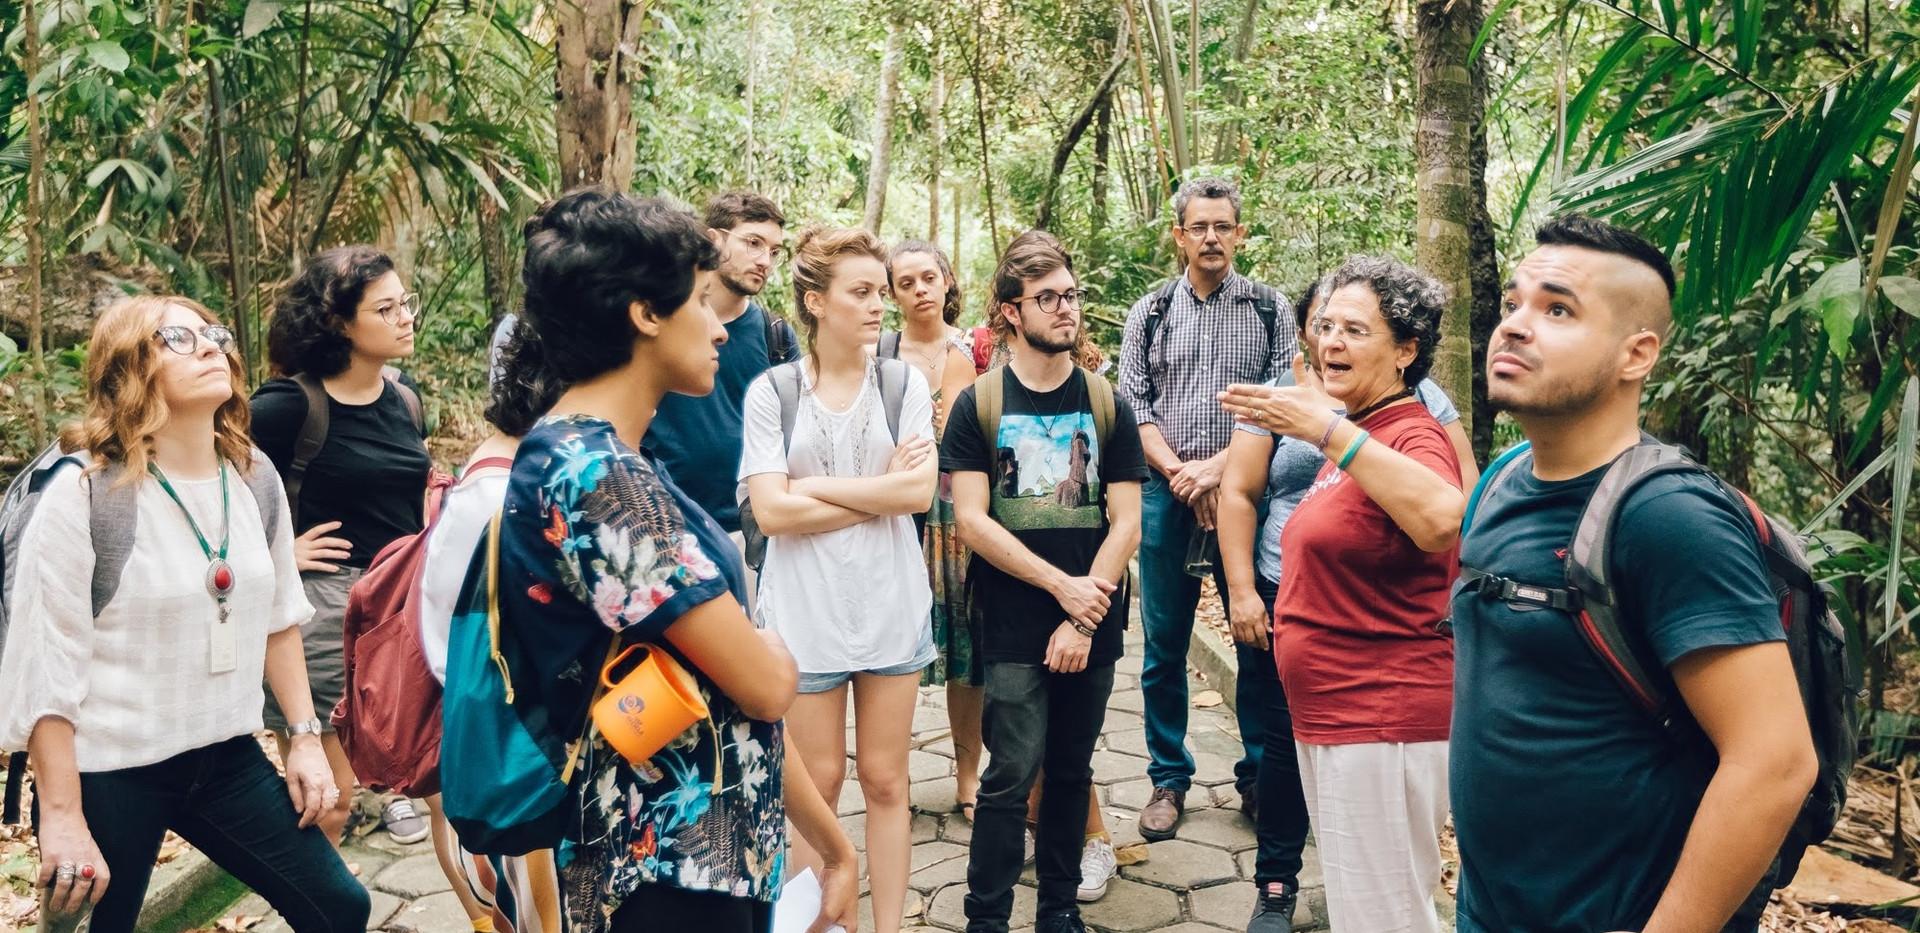 Bosque da Ciencia com Rita Mesquita.jpg